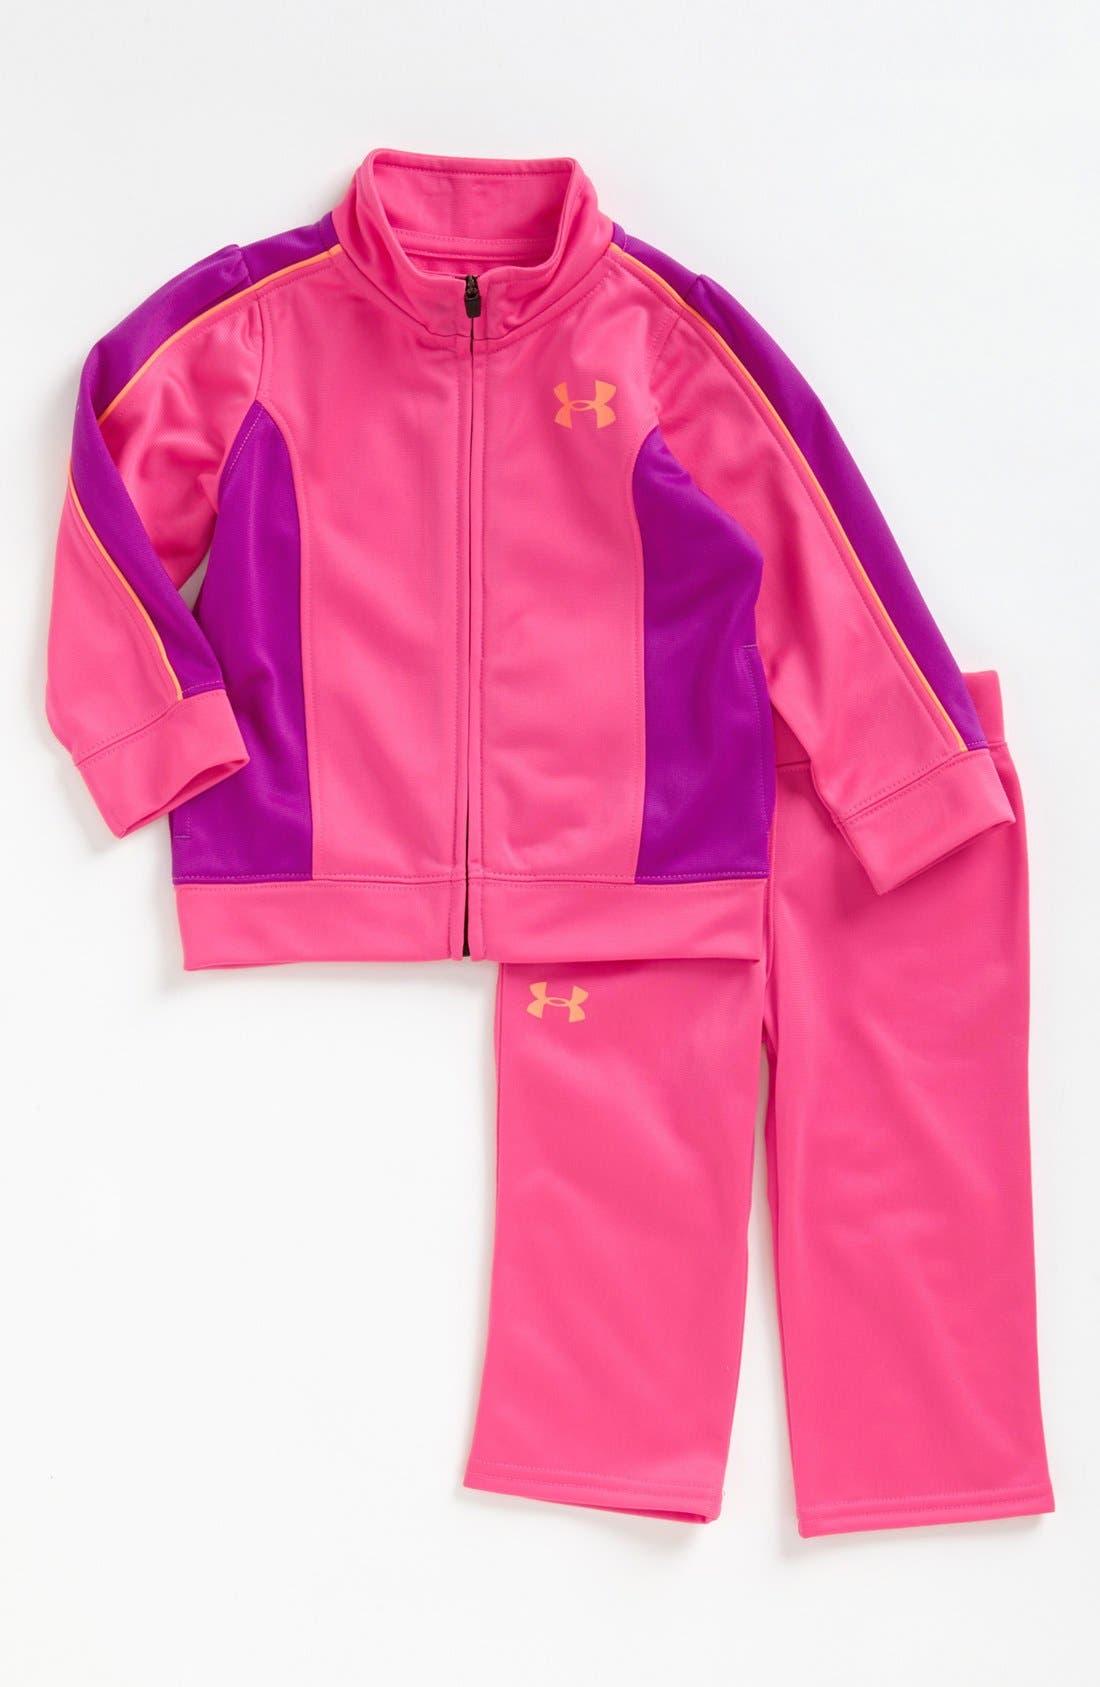 Alternate Image 1 Selected - Under Armour Track Jacket & Pants (Toddler Girls) (Online Only)